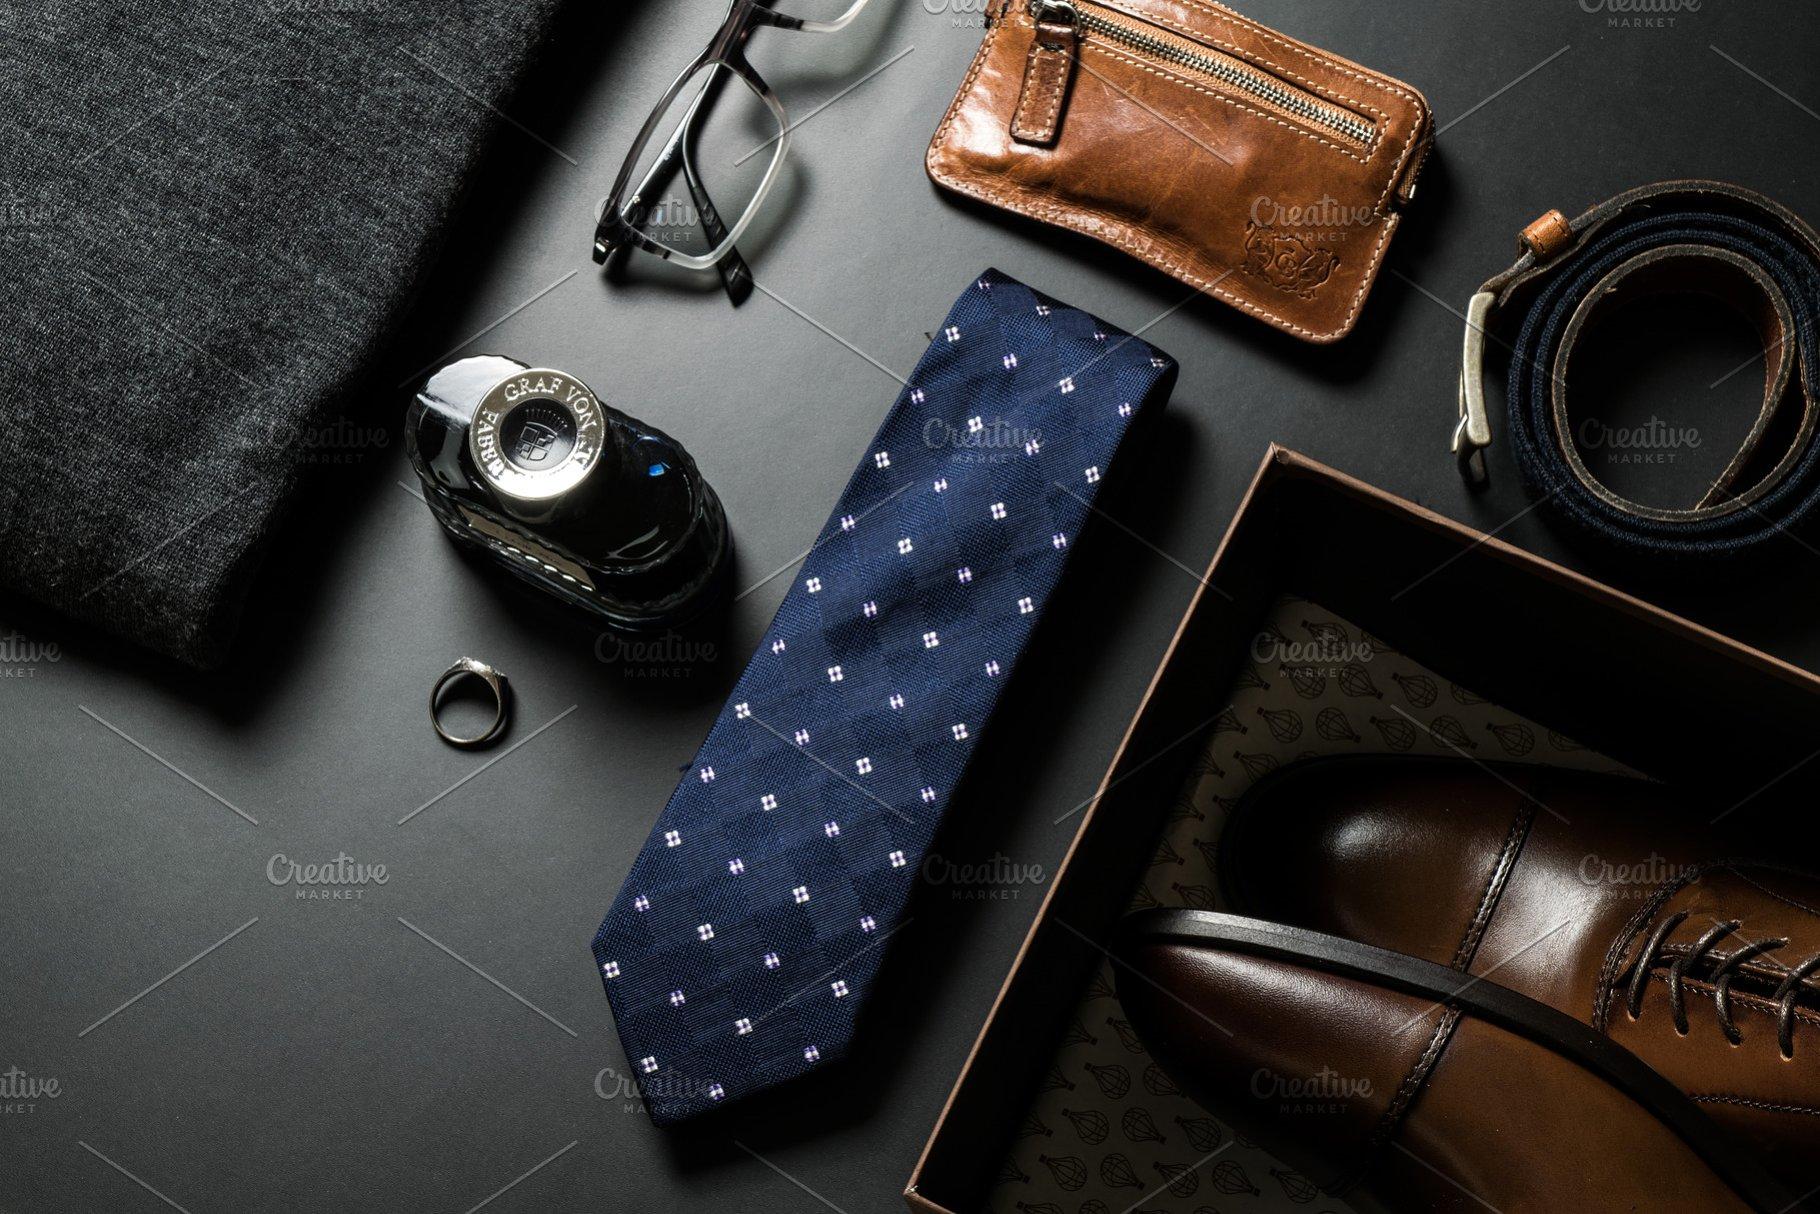 36ad2bf18 Men s fashion accessories VIII ~ Beauty   Fashion Photos ~ Creative ...